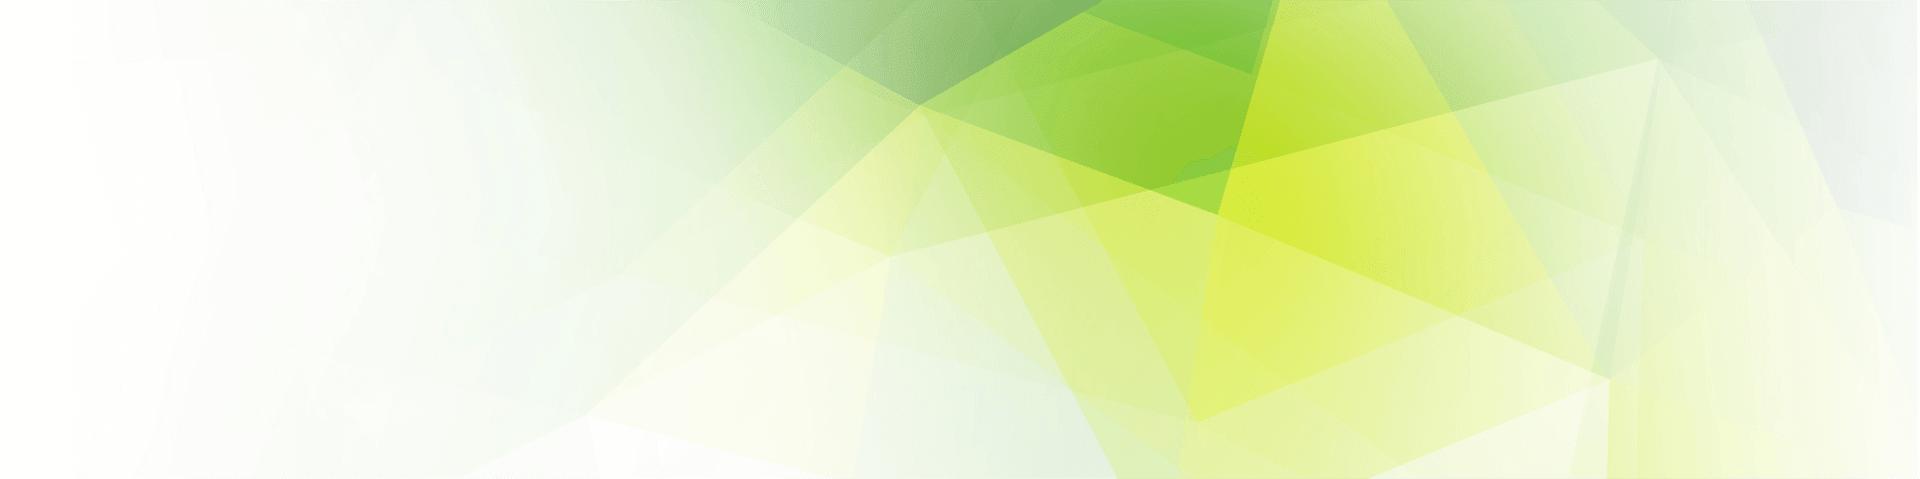 slides_green1_ns8qty